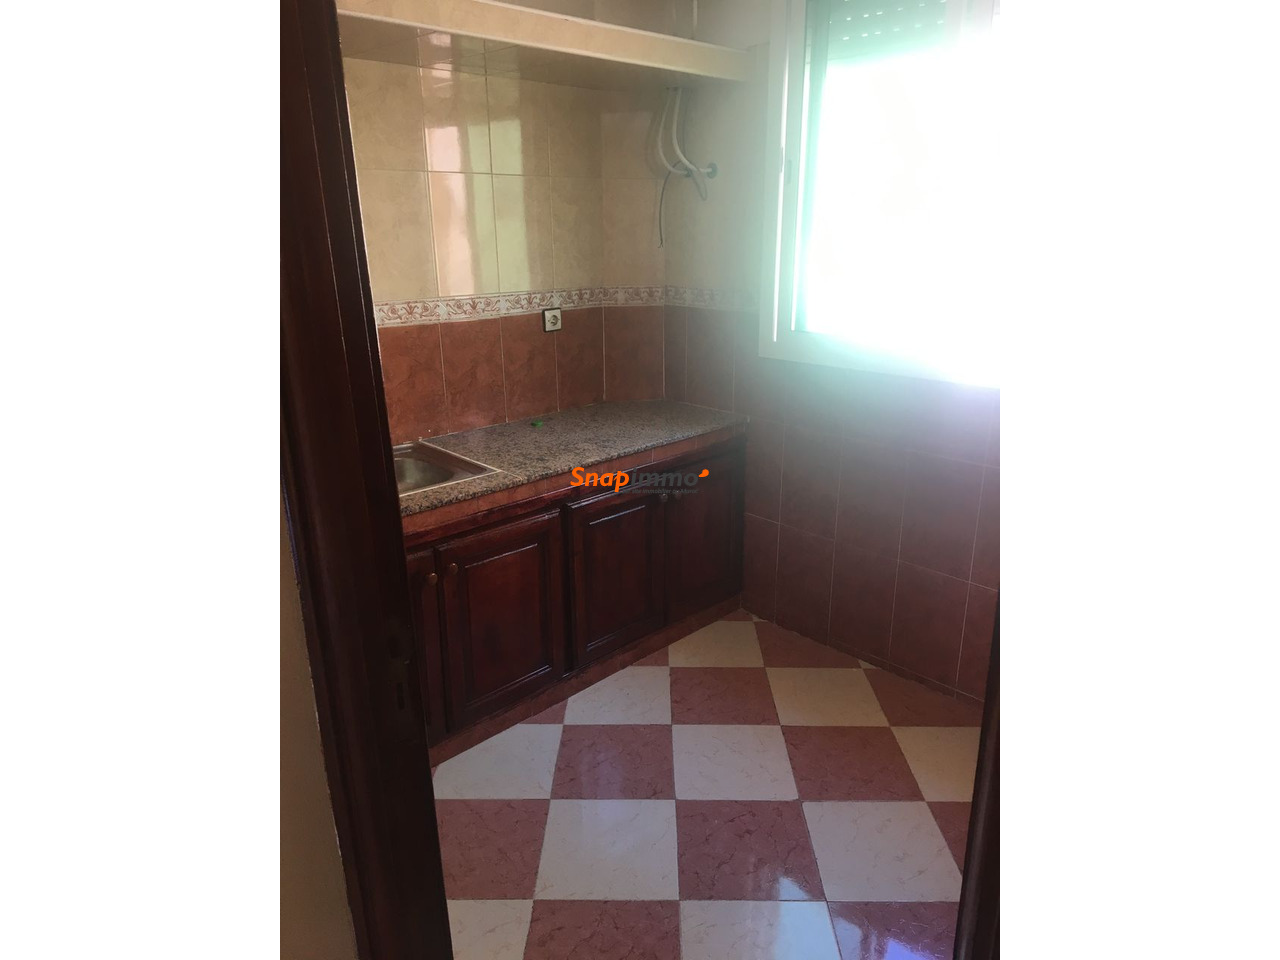 Vente appartement 4 pièces quartier ESSADIK – Mohammedia - 3/4